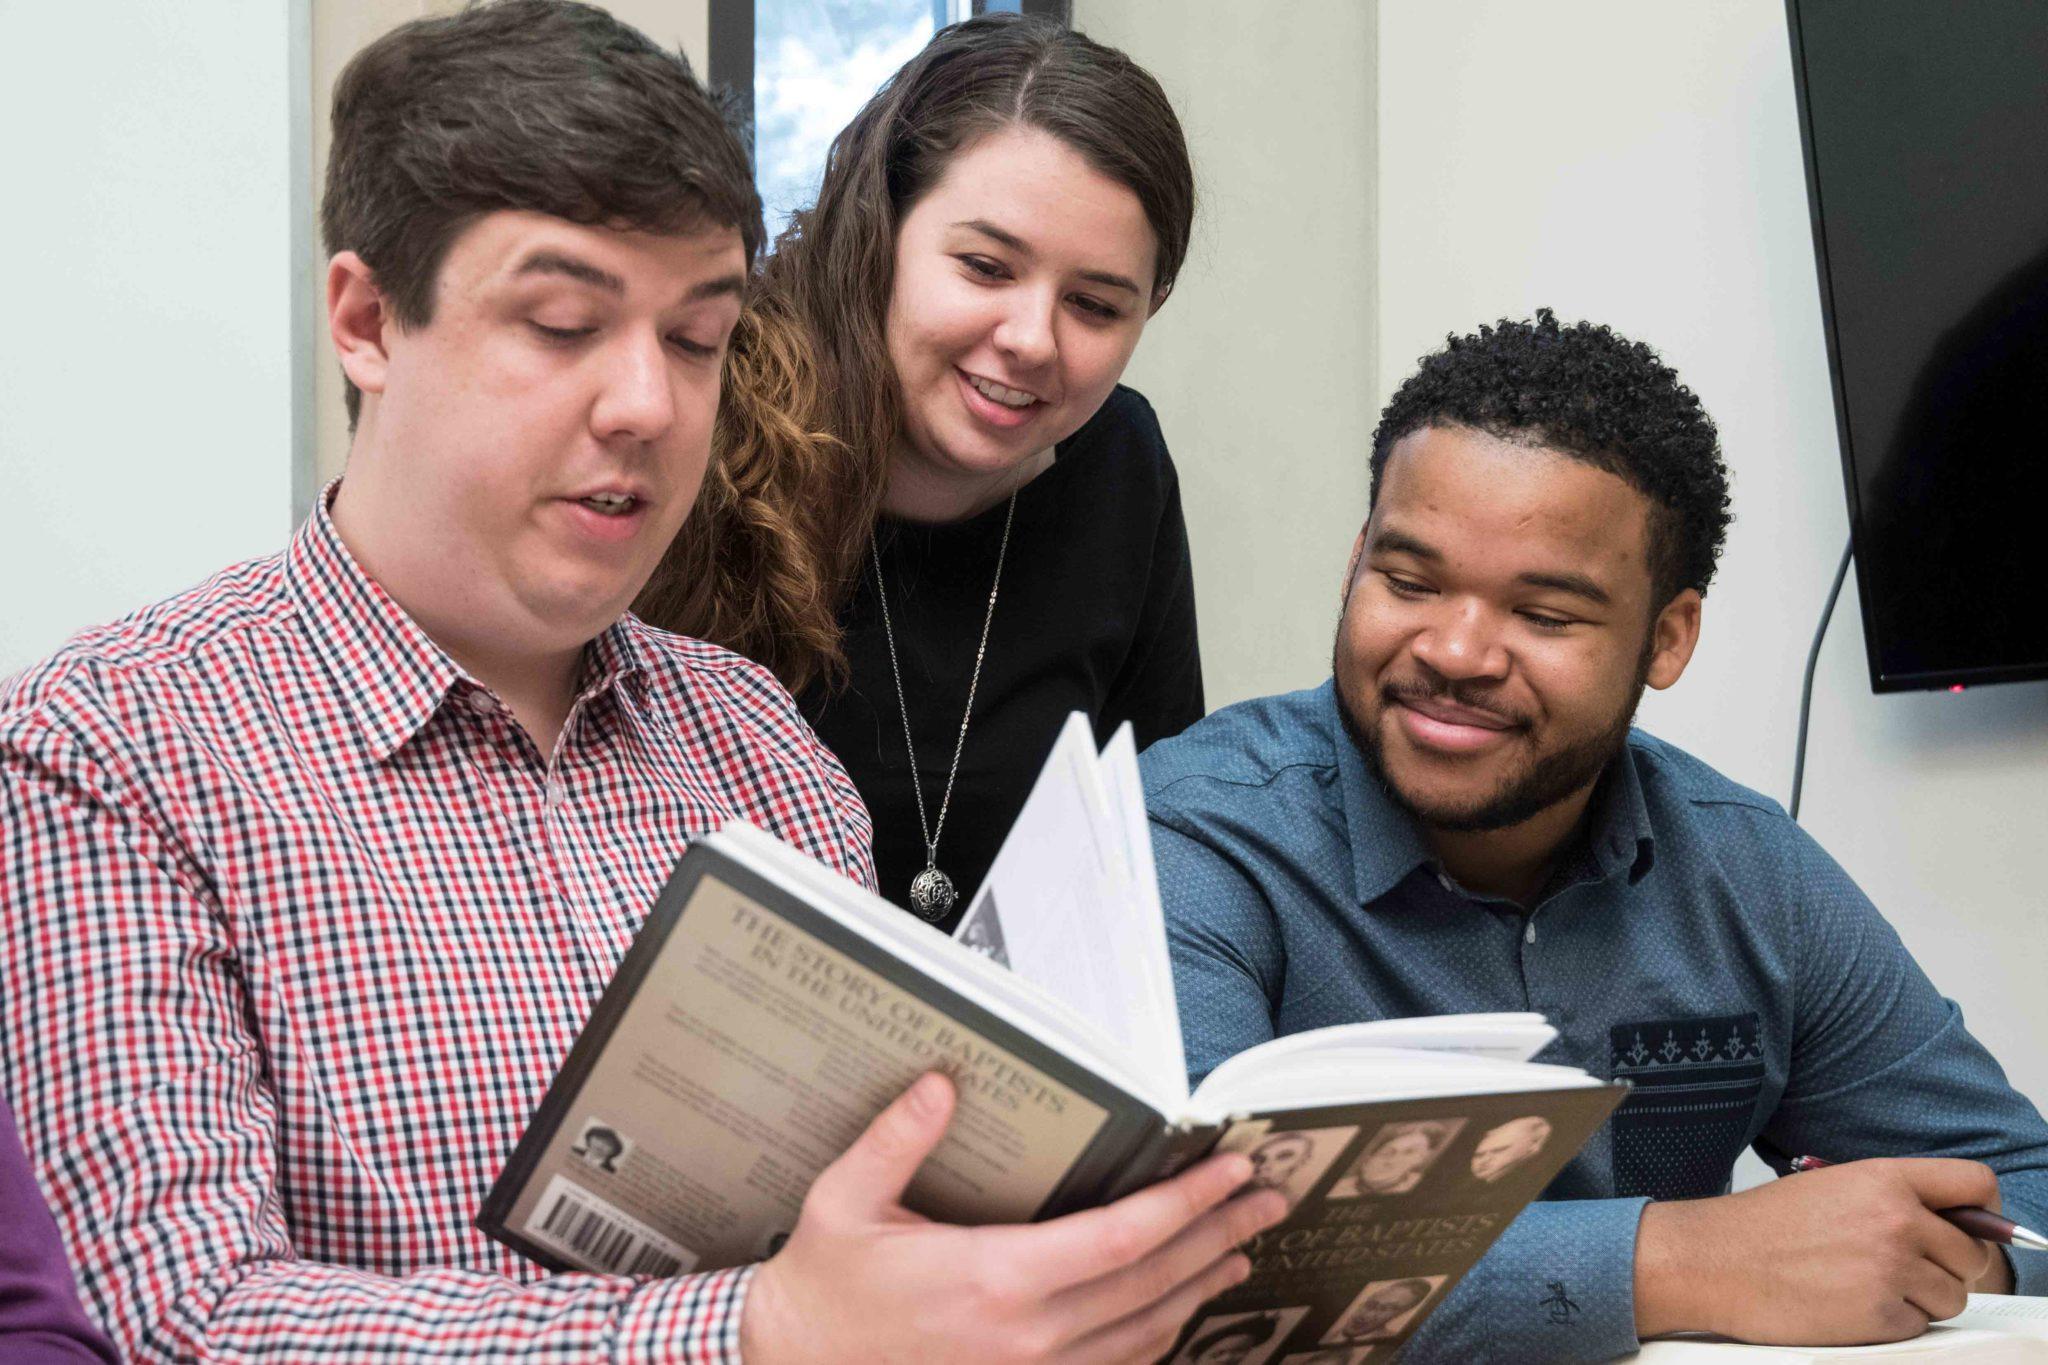 Three students look at a book.